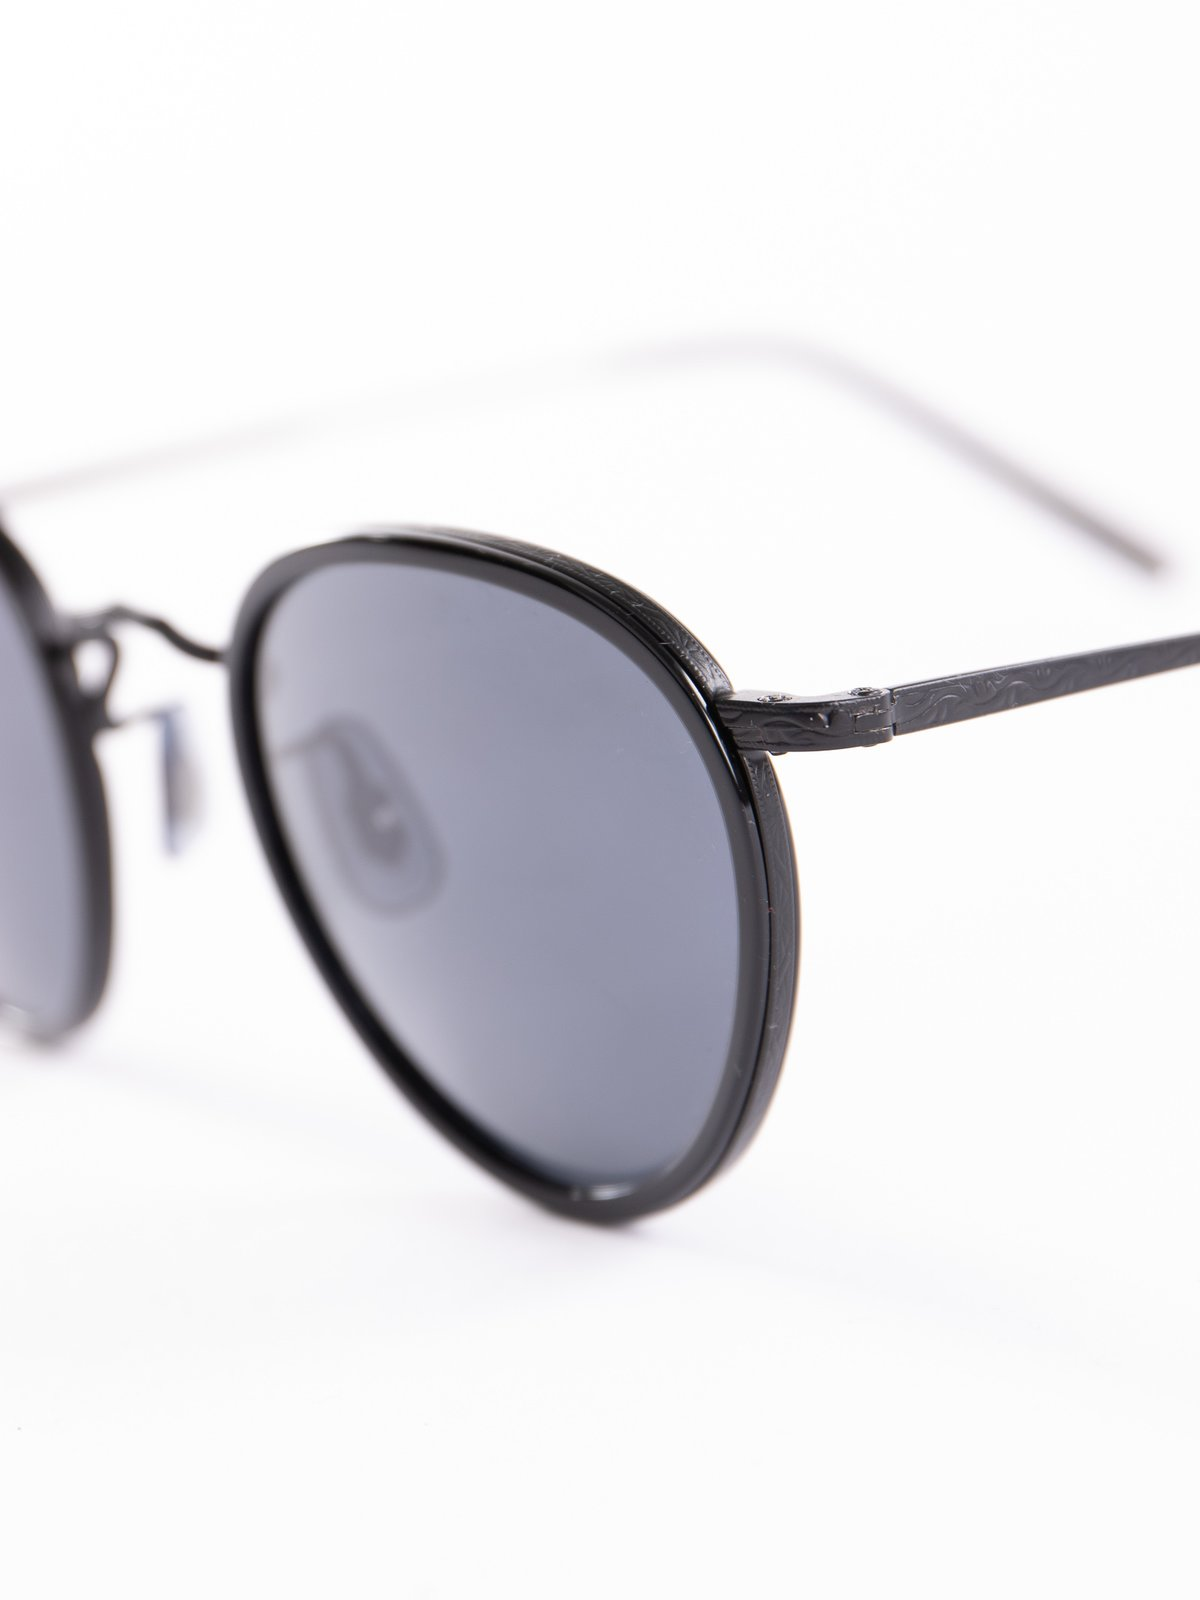 Black–Matte Black/Blue MP–2 Sunglasses - Image 3